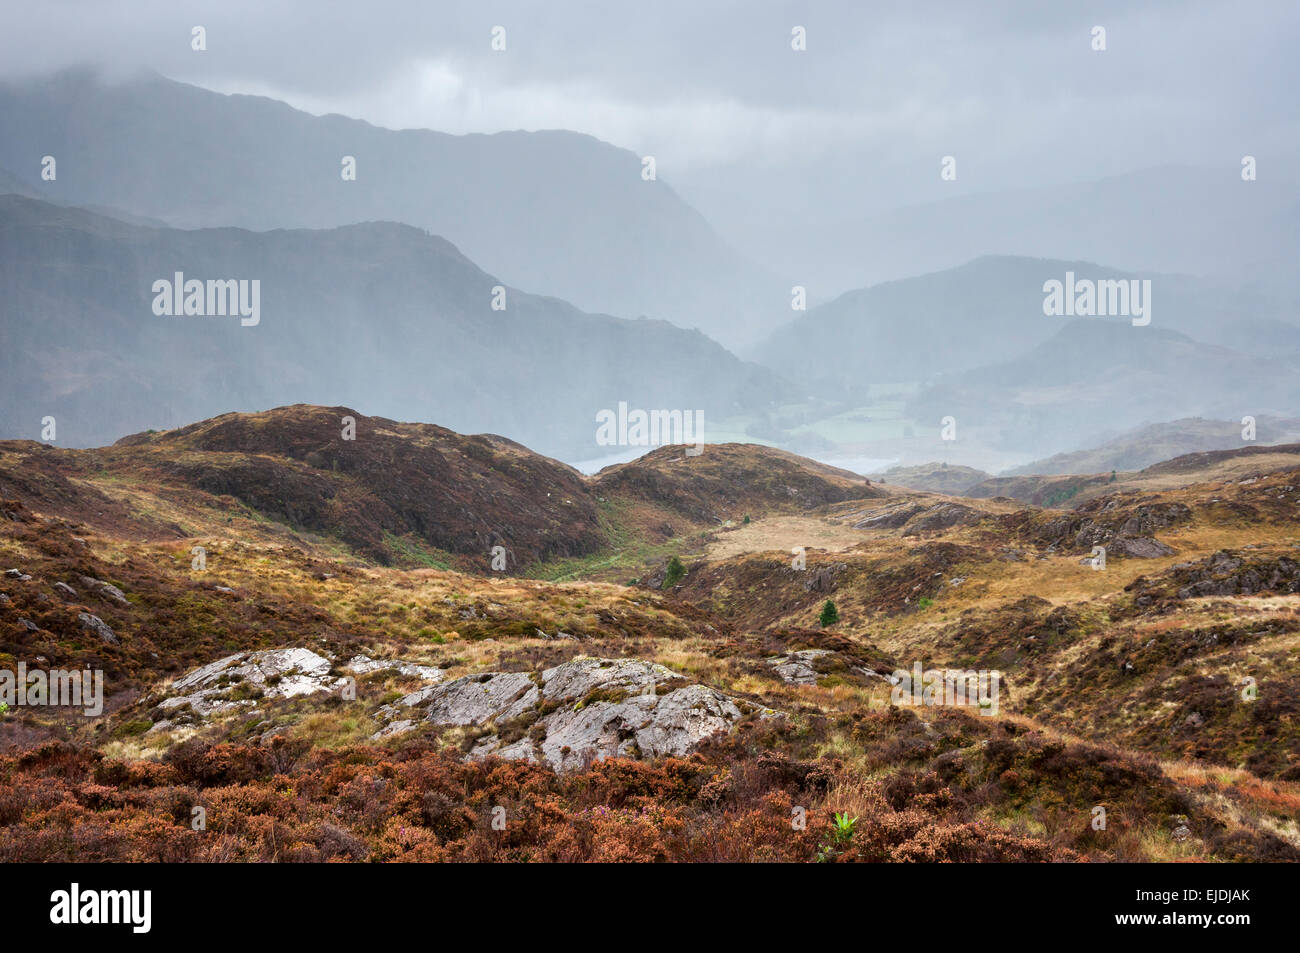 Dramatic rainy weather in Snowdonia. Rain falling on hills and mountains near Beddgelert. Stock Photo